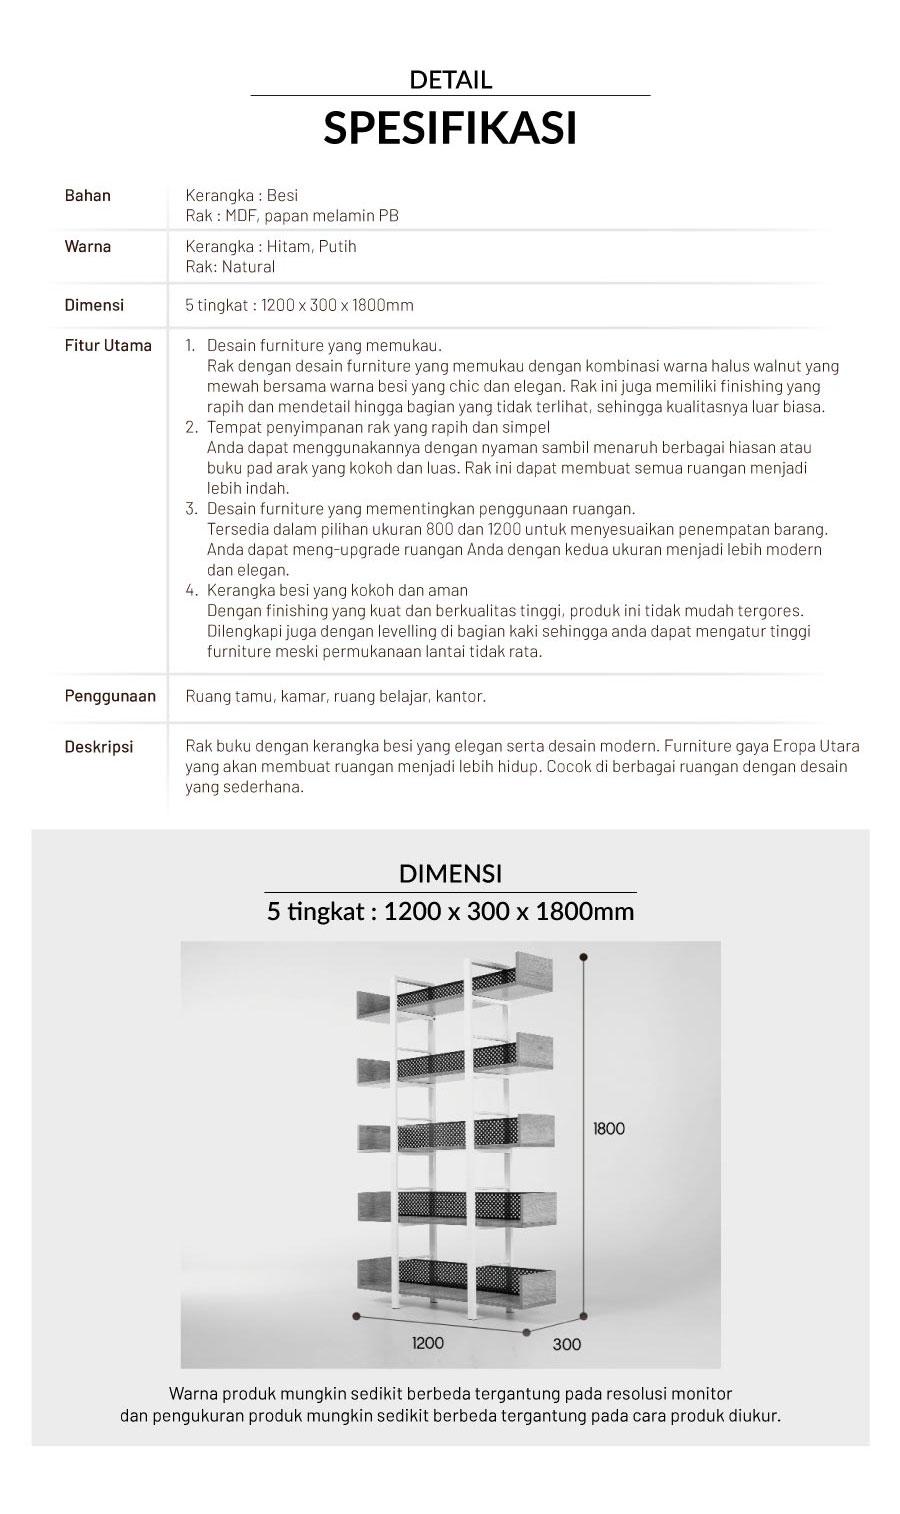 kit_1200_5_information.jpg